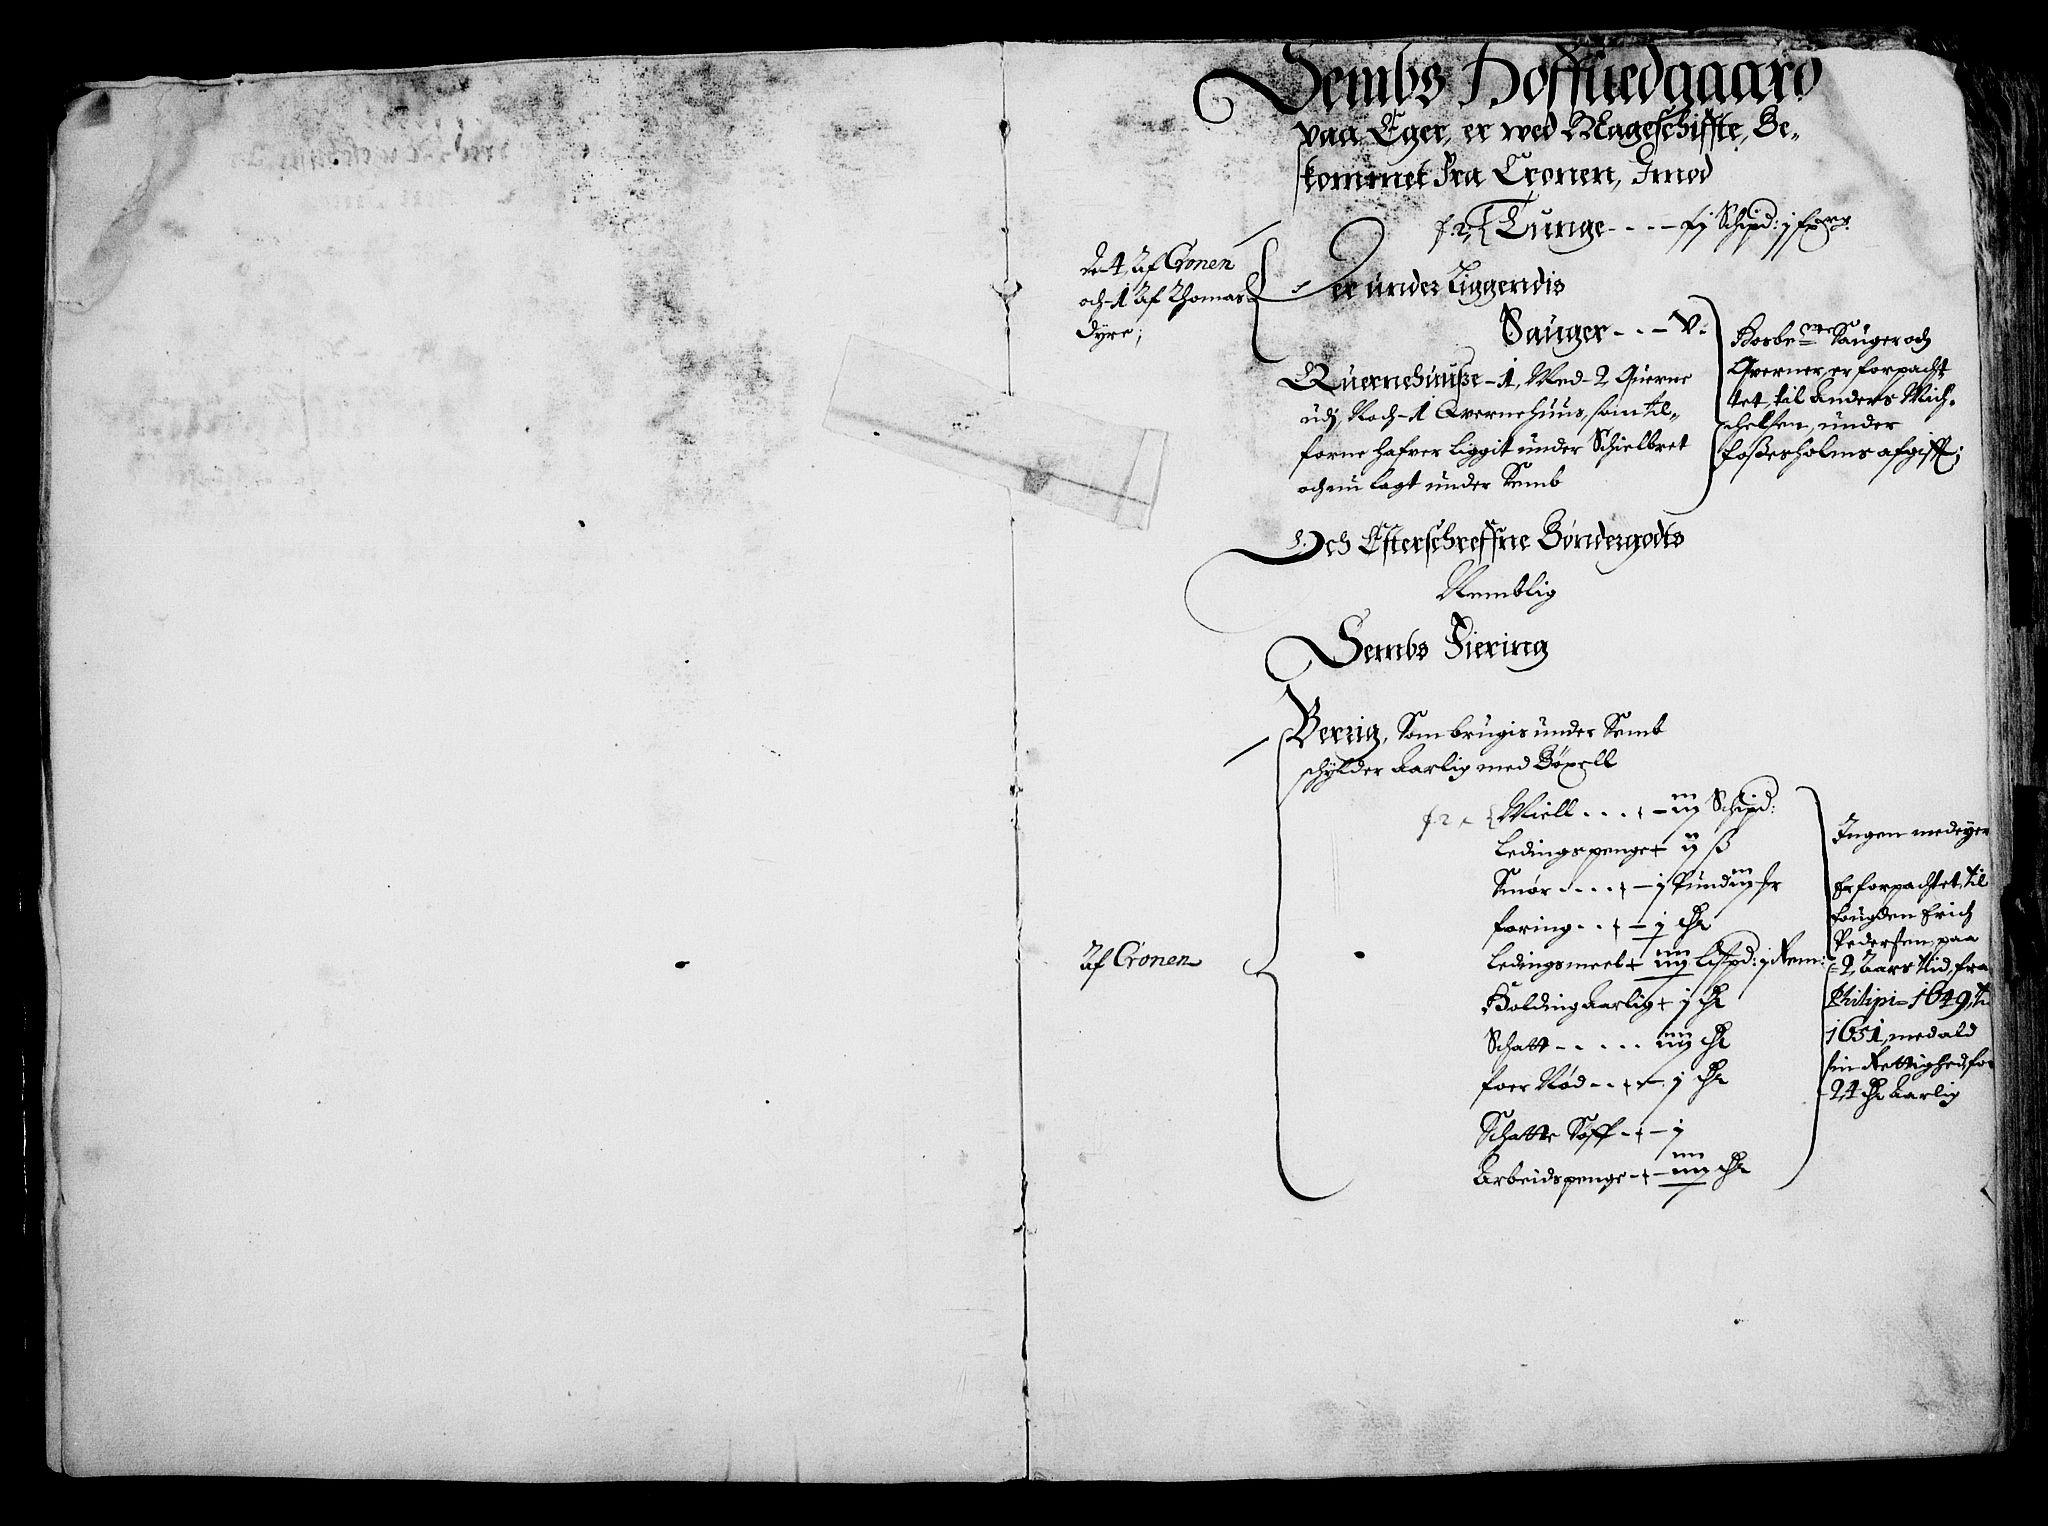 RA, Rentekammeret inntil 1814, Realistisk ordnet avdeling, On/L0001: Statens gods, 1651, s. 3